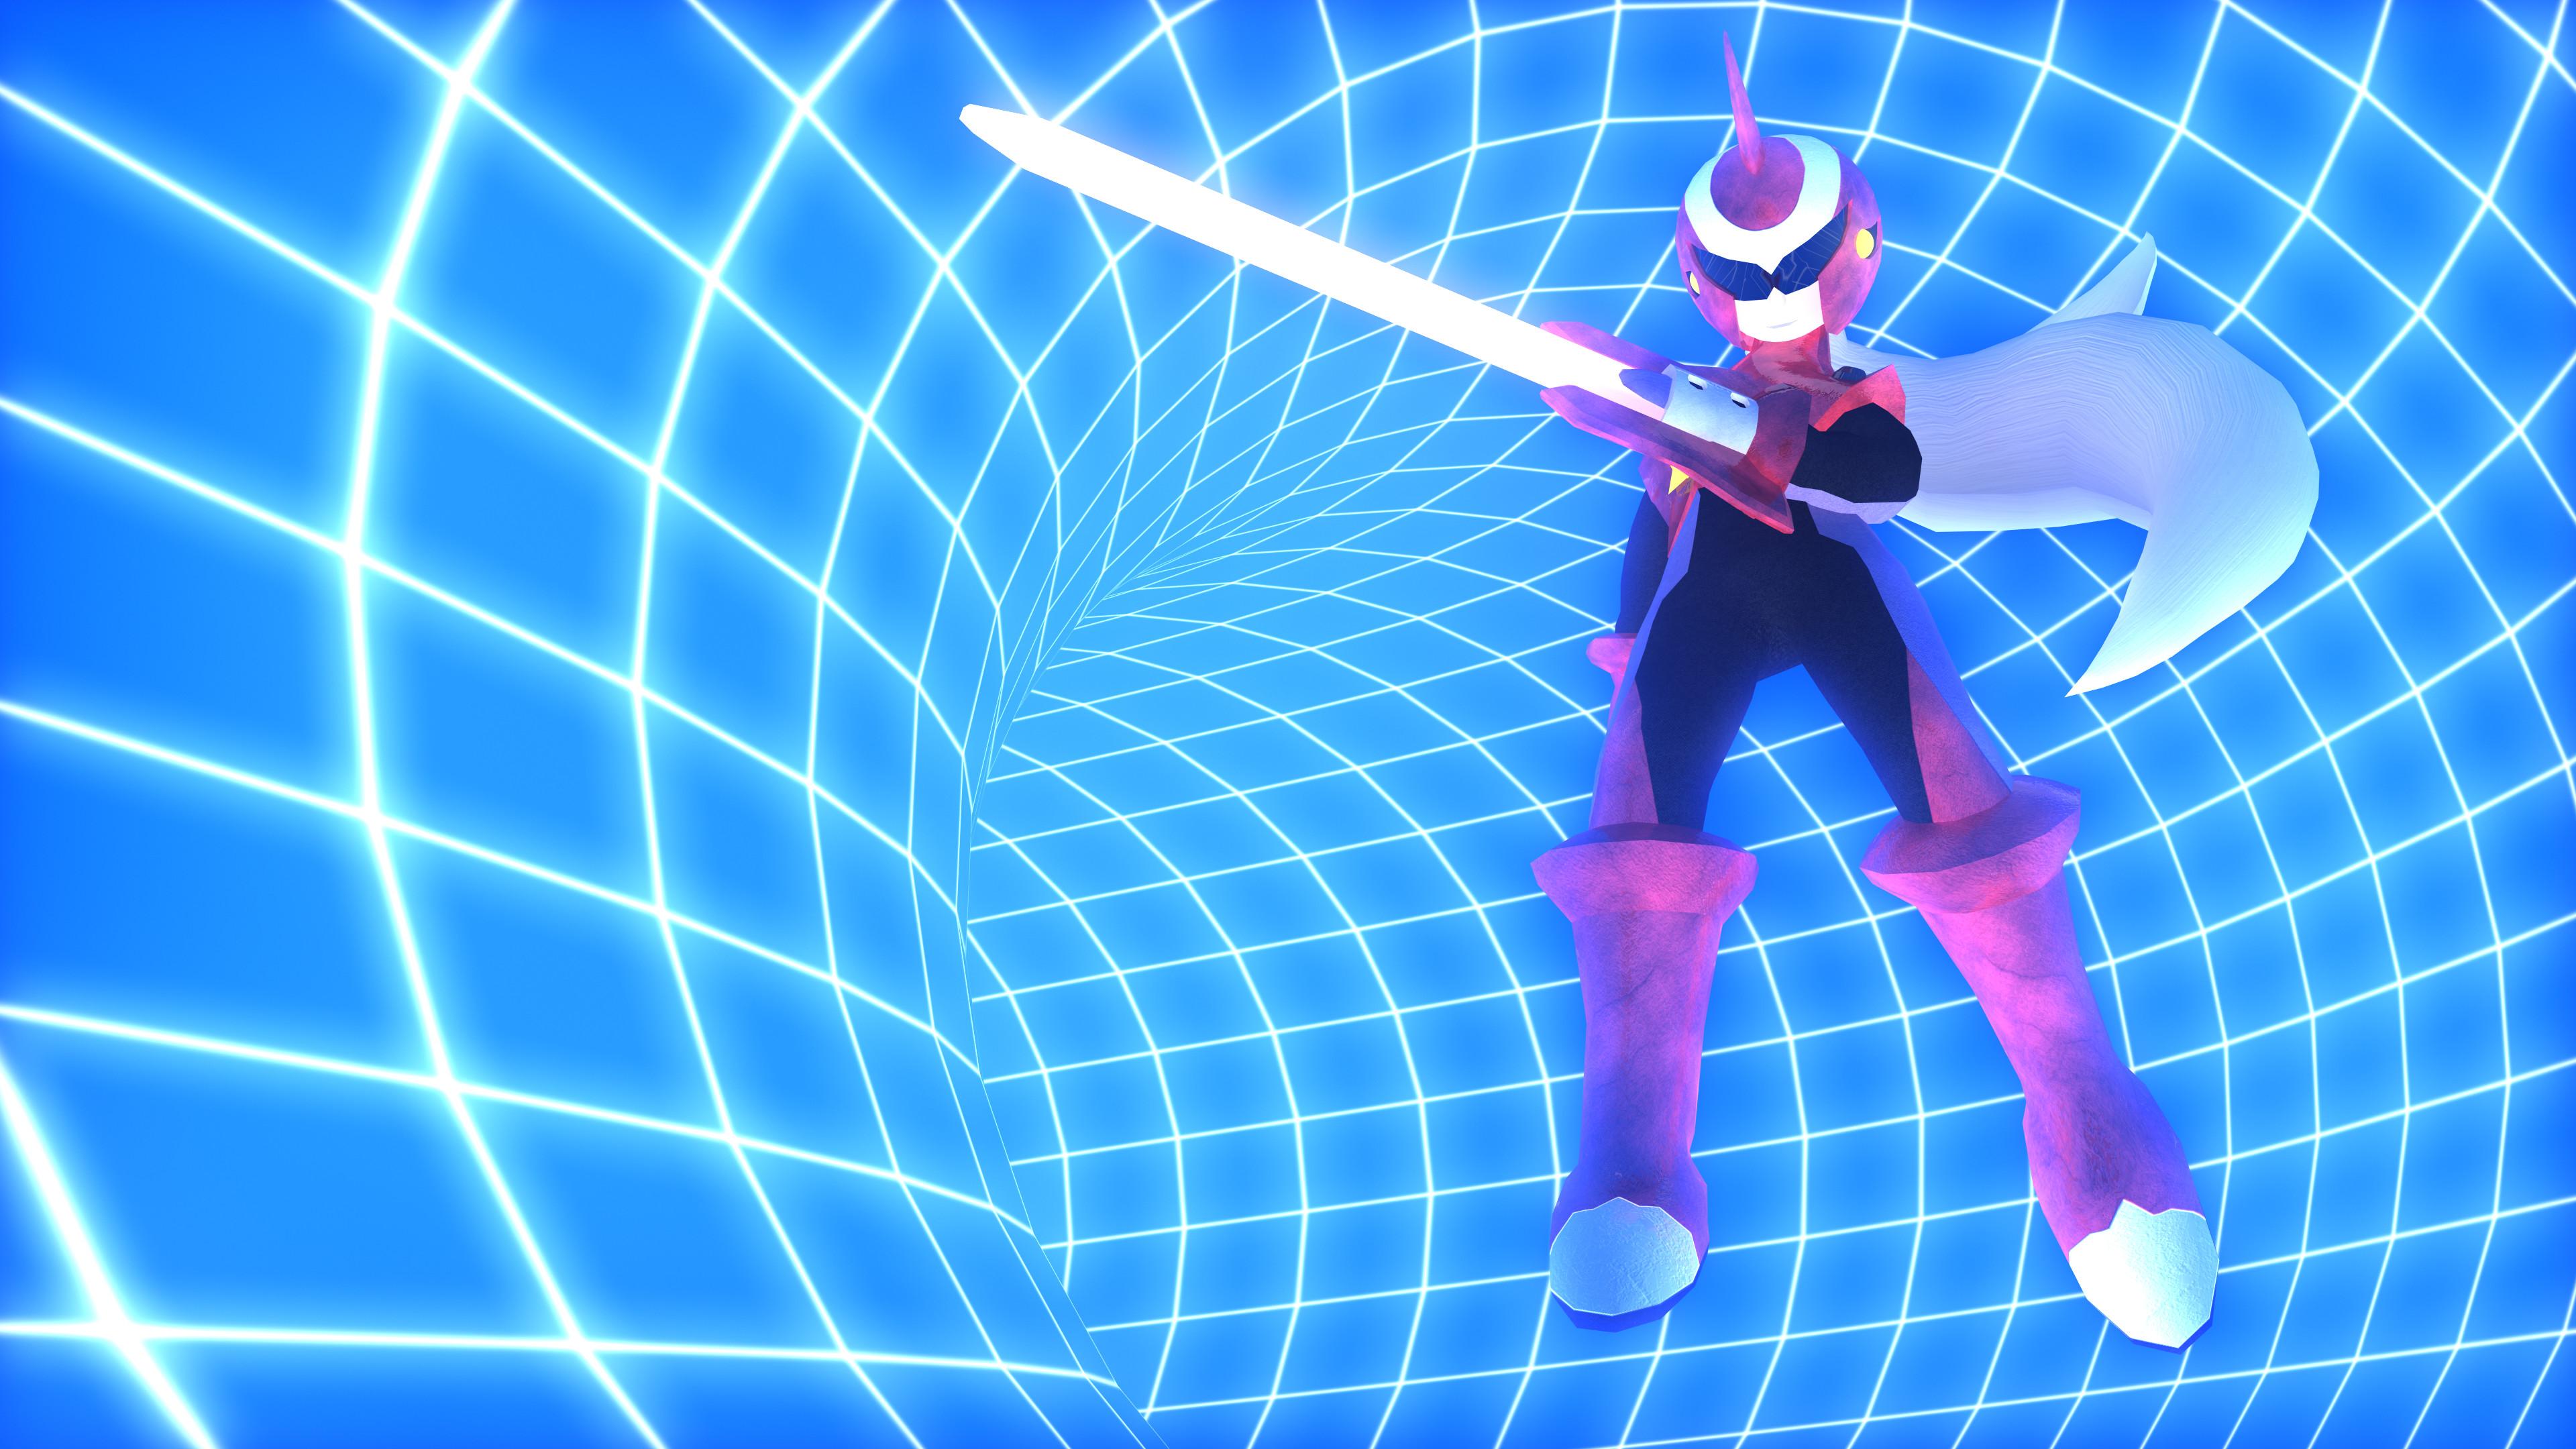 … Mega Man – Protoman.EXE 3D Model Render #3 by Stef93